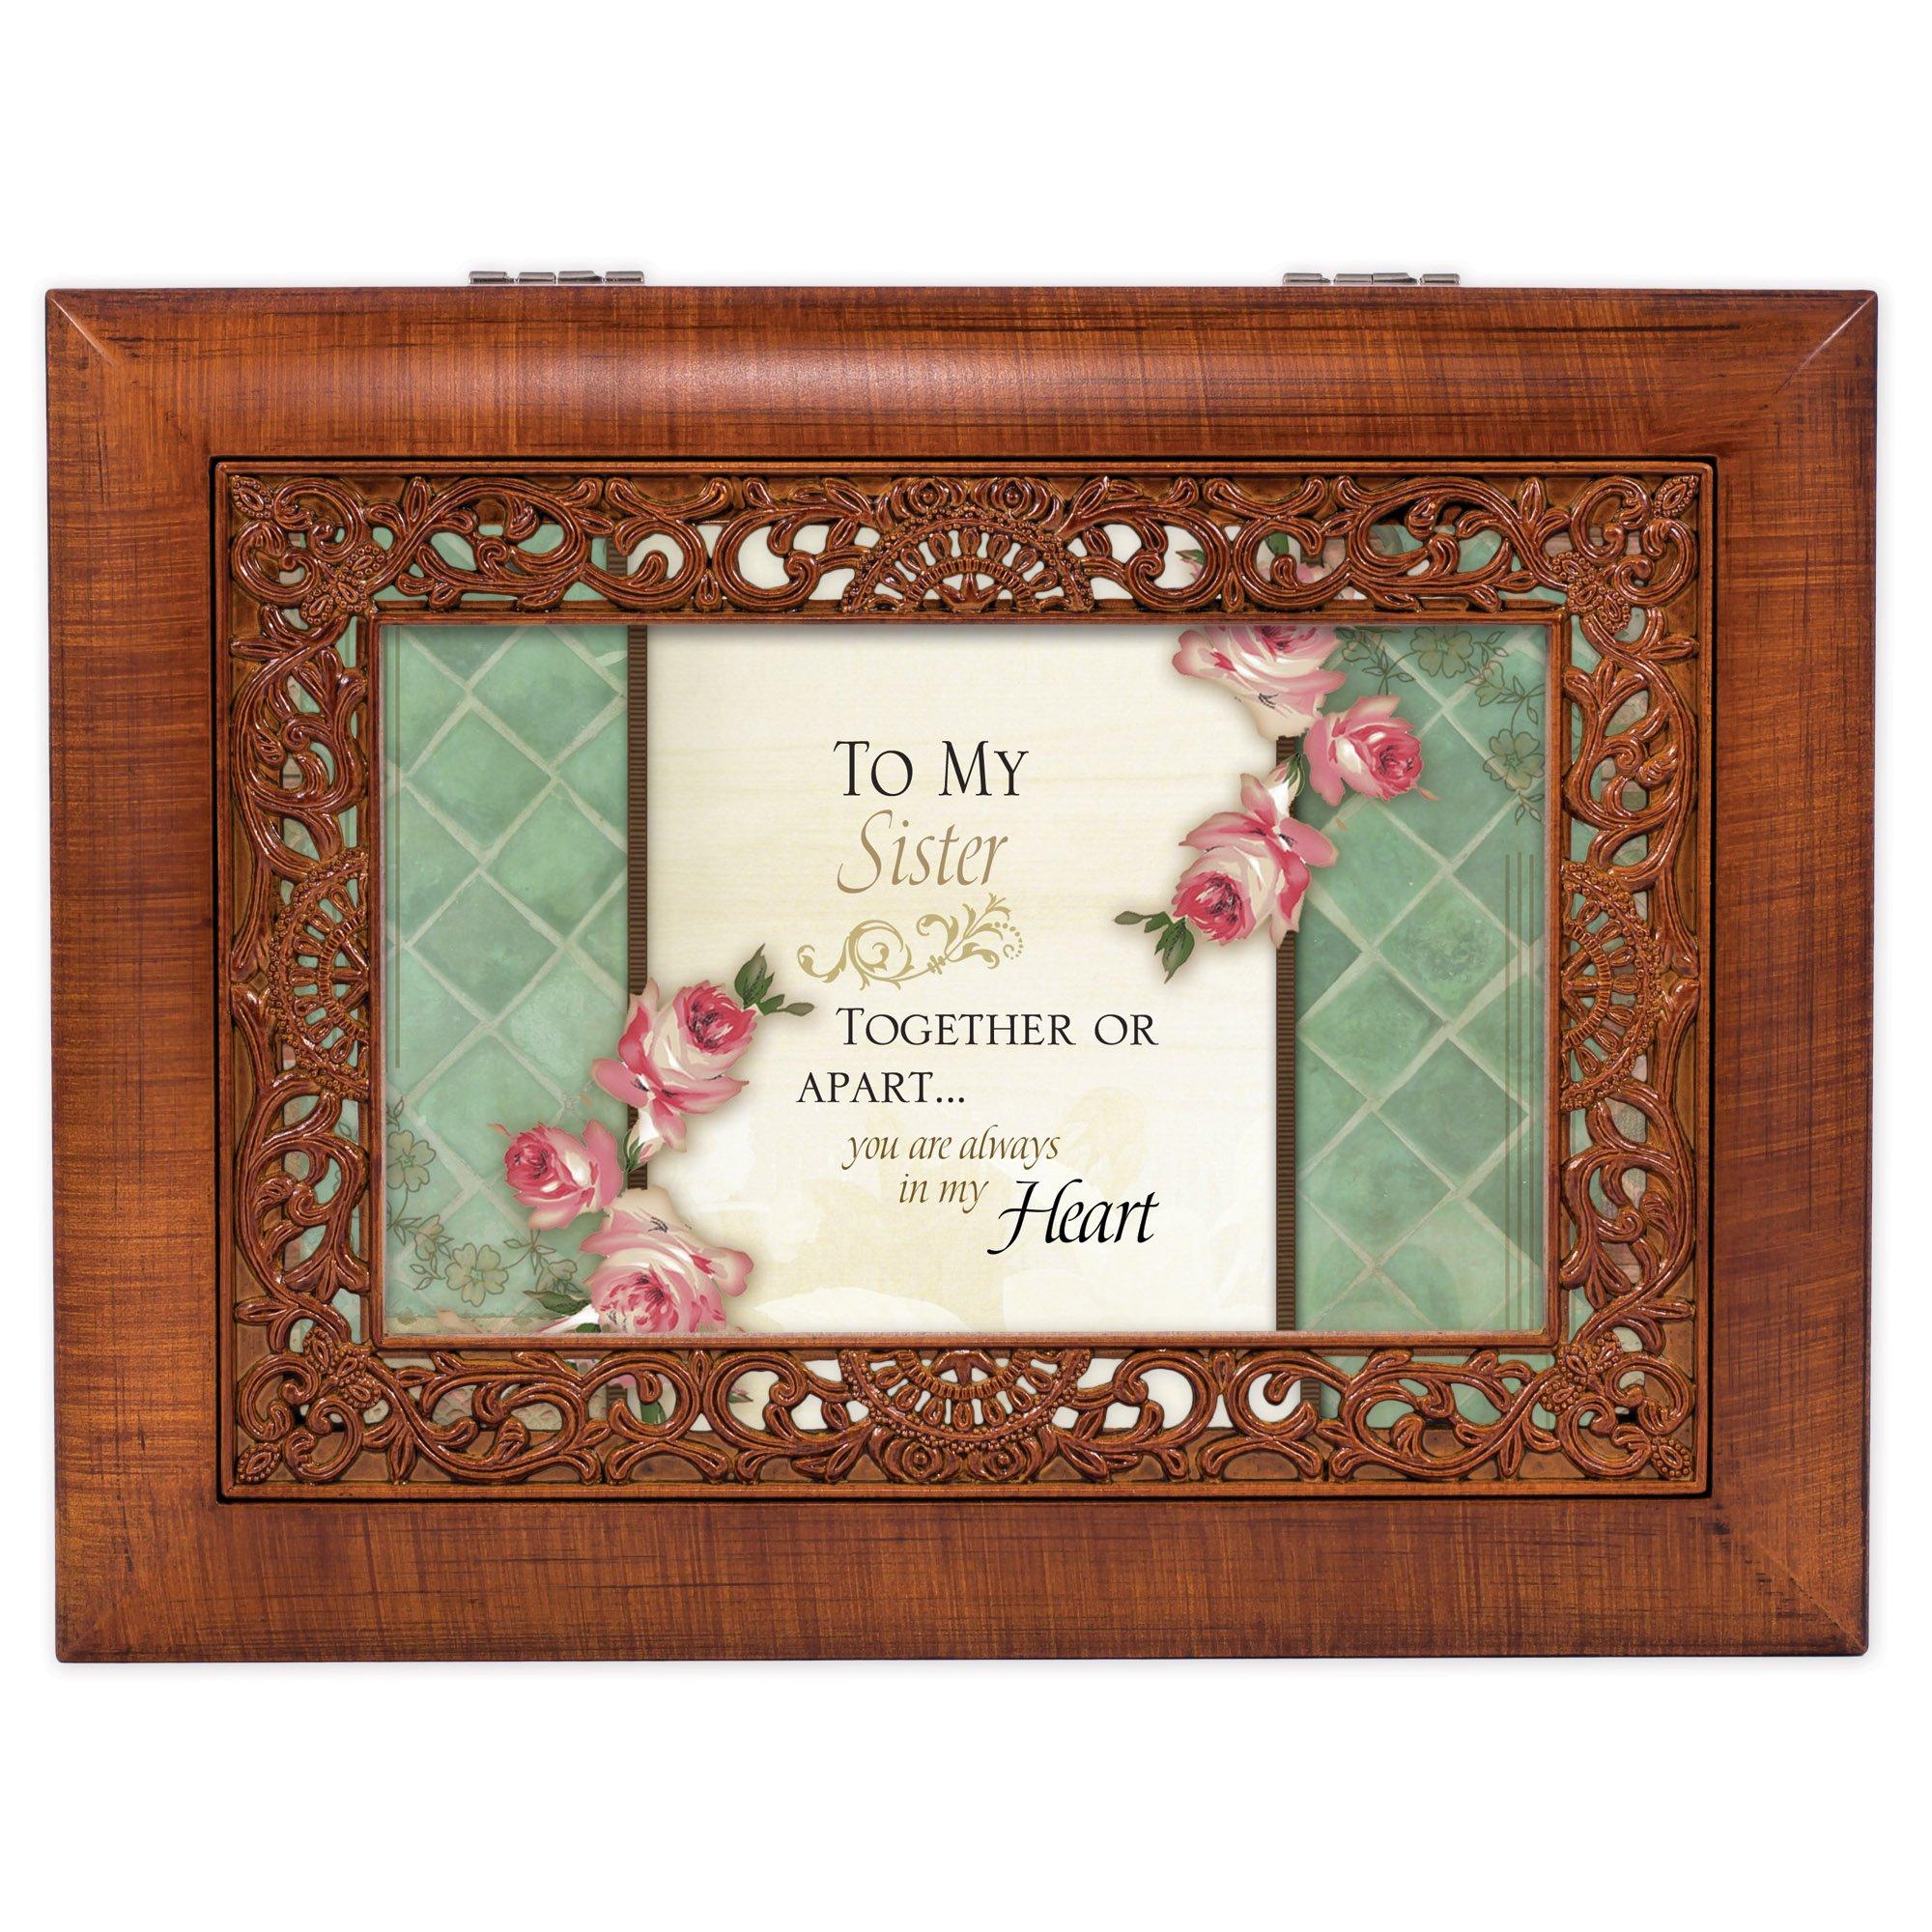 Cottage Garden Sister Woodgrain Ornate Music Box Plays Wonderful World by Cottage Garden (Image #2)